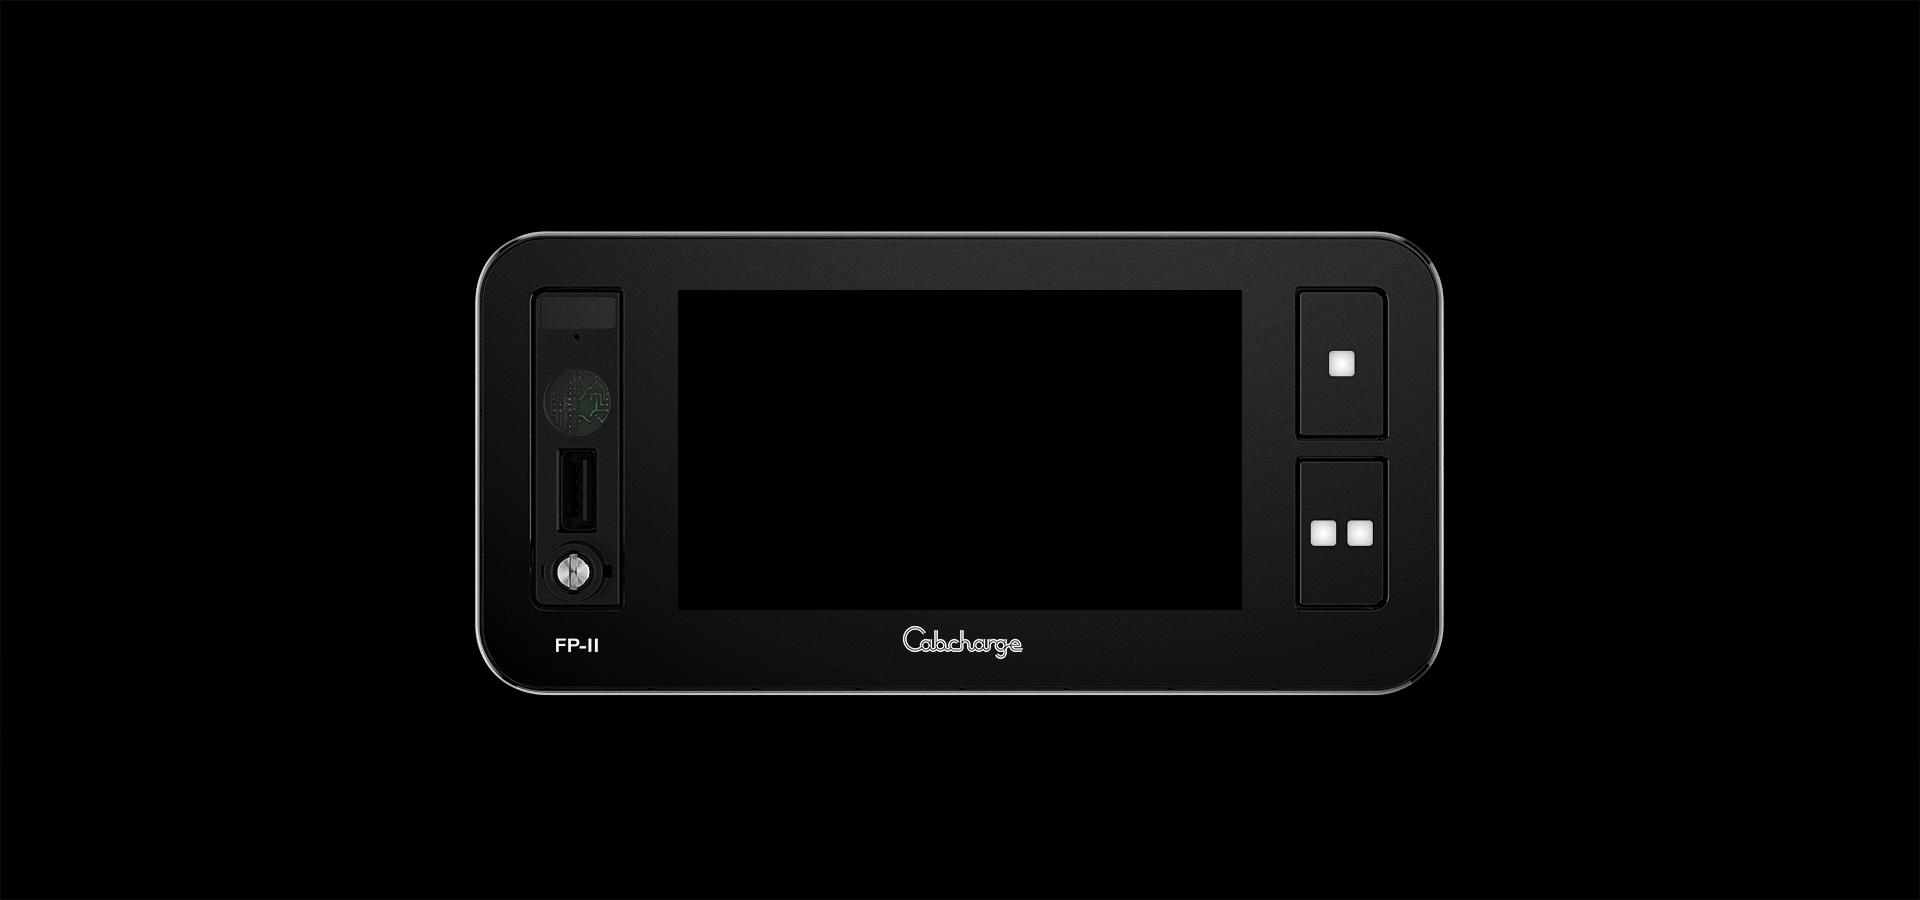 cabcharge-01.jpg